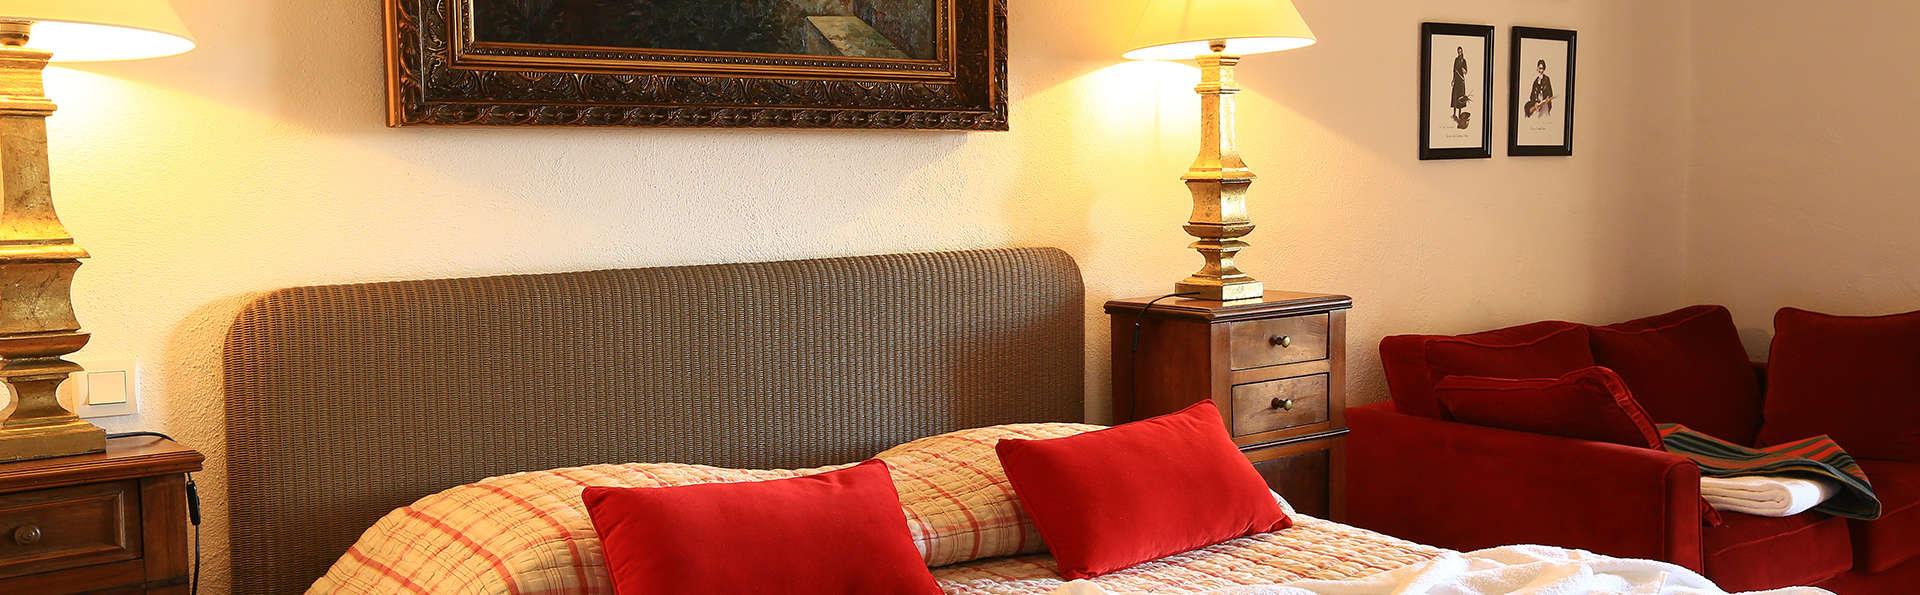 Hôtel Demeure Castel Brando - EDIT_room4.jpg